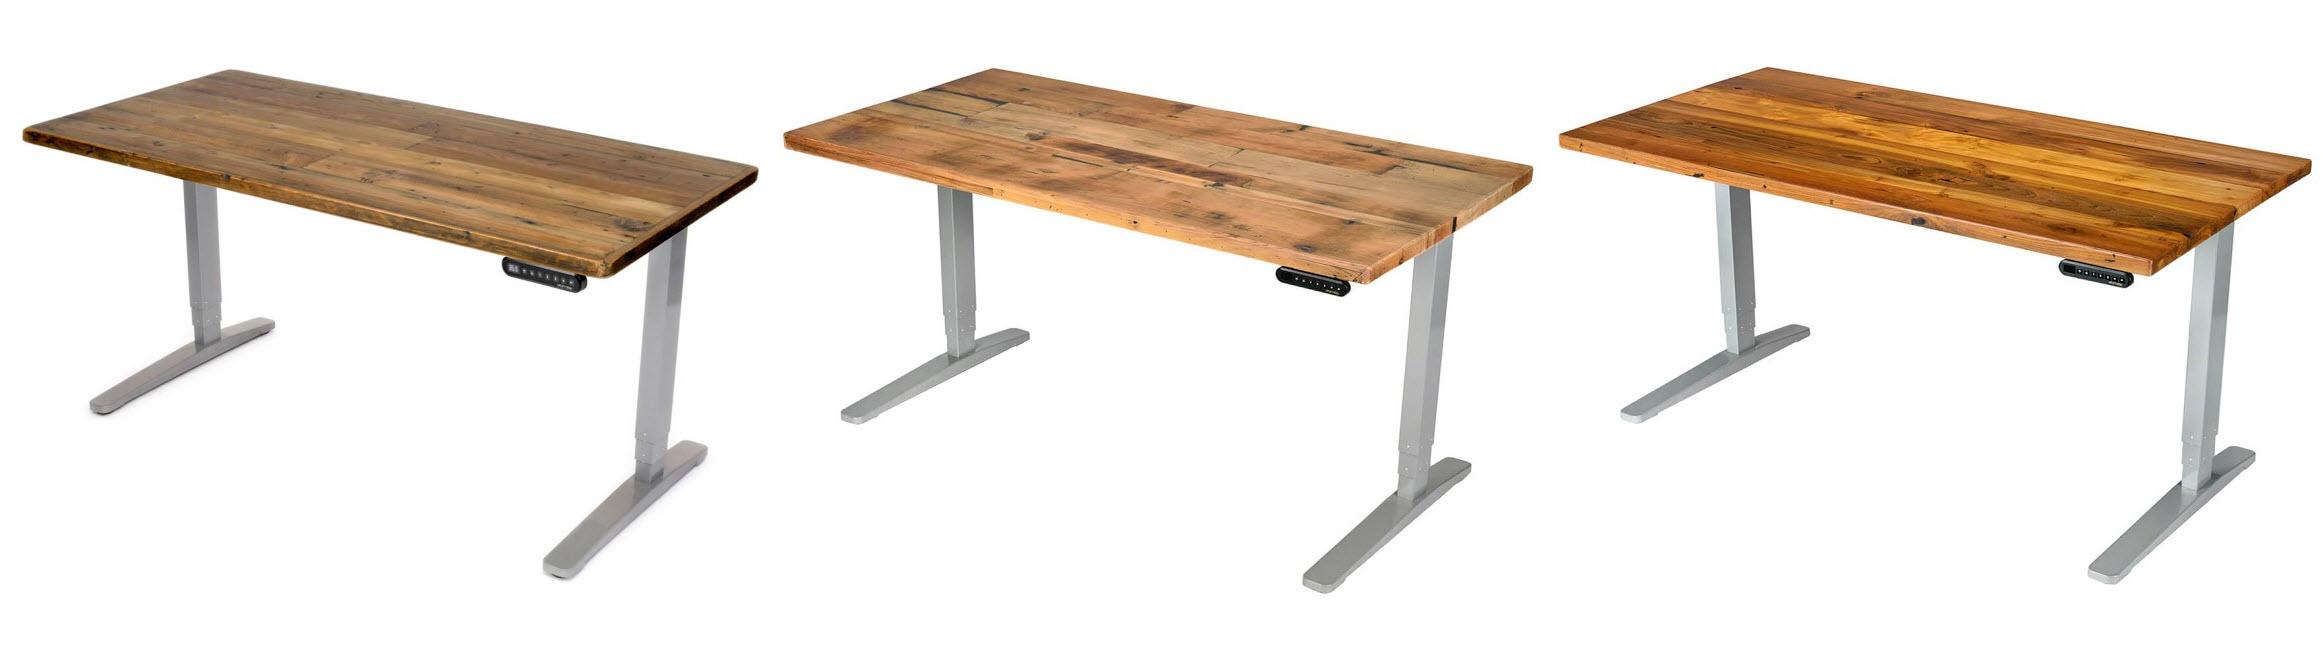 Uplift reclaimed wood